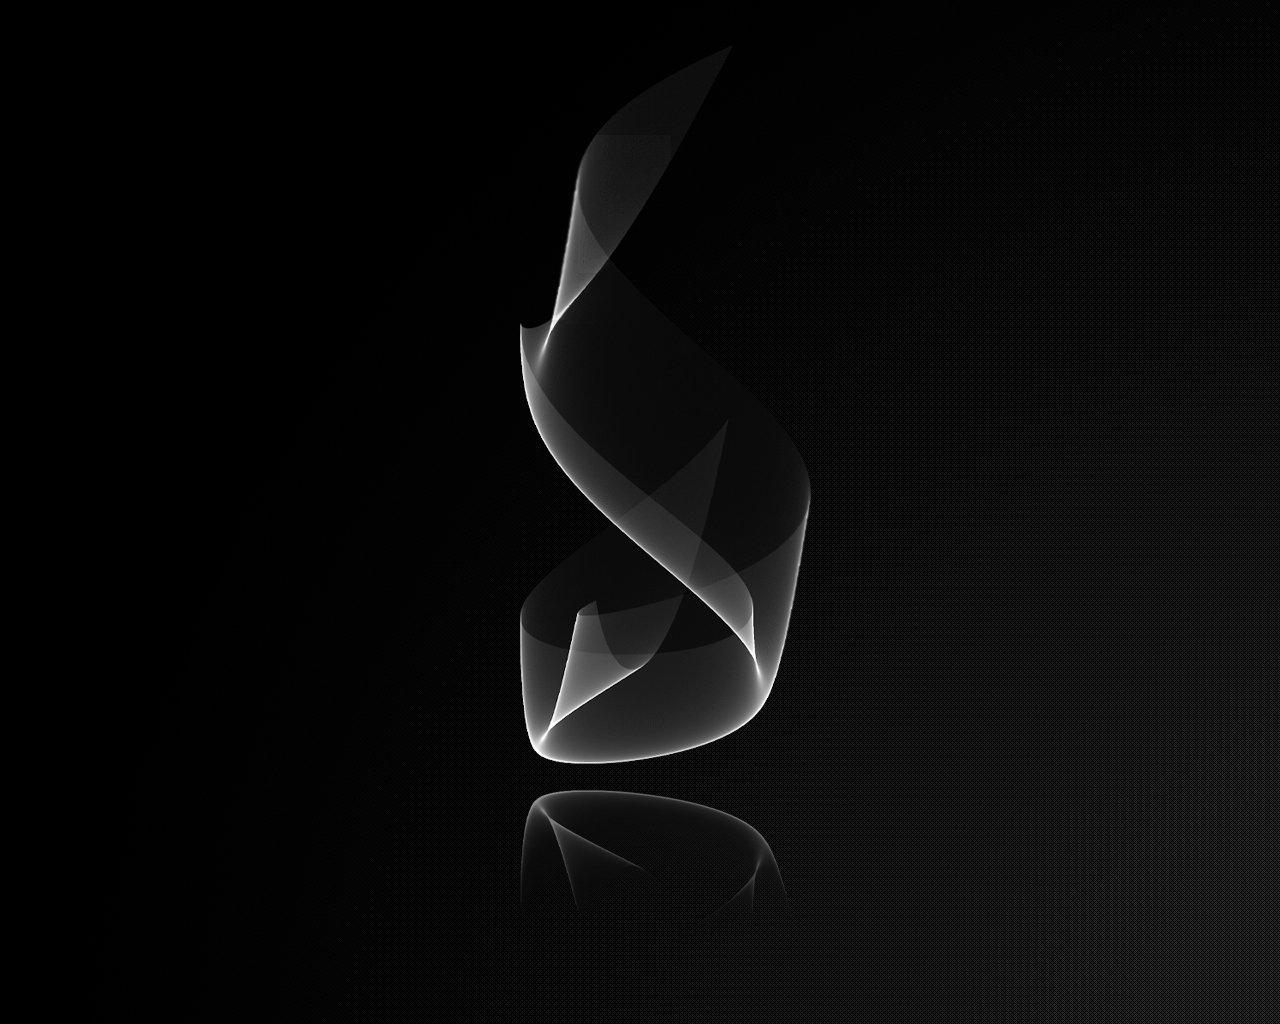 Black and silver colors 4 desktop wallpaper for Black and silver 3d wallpaper